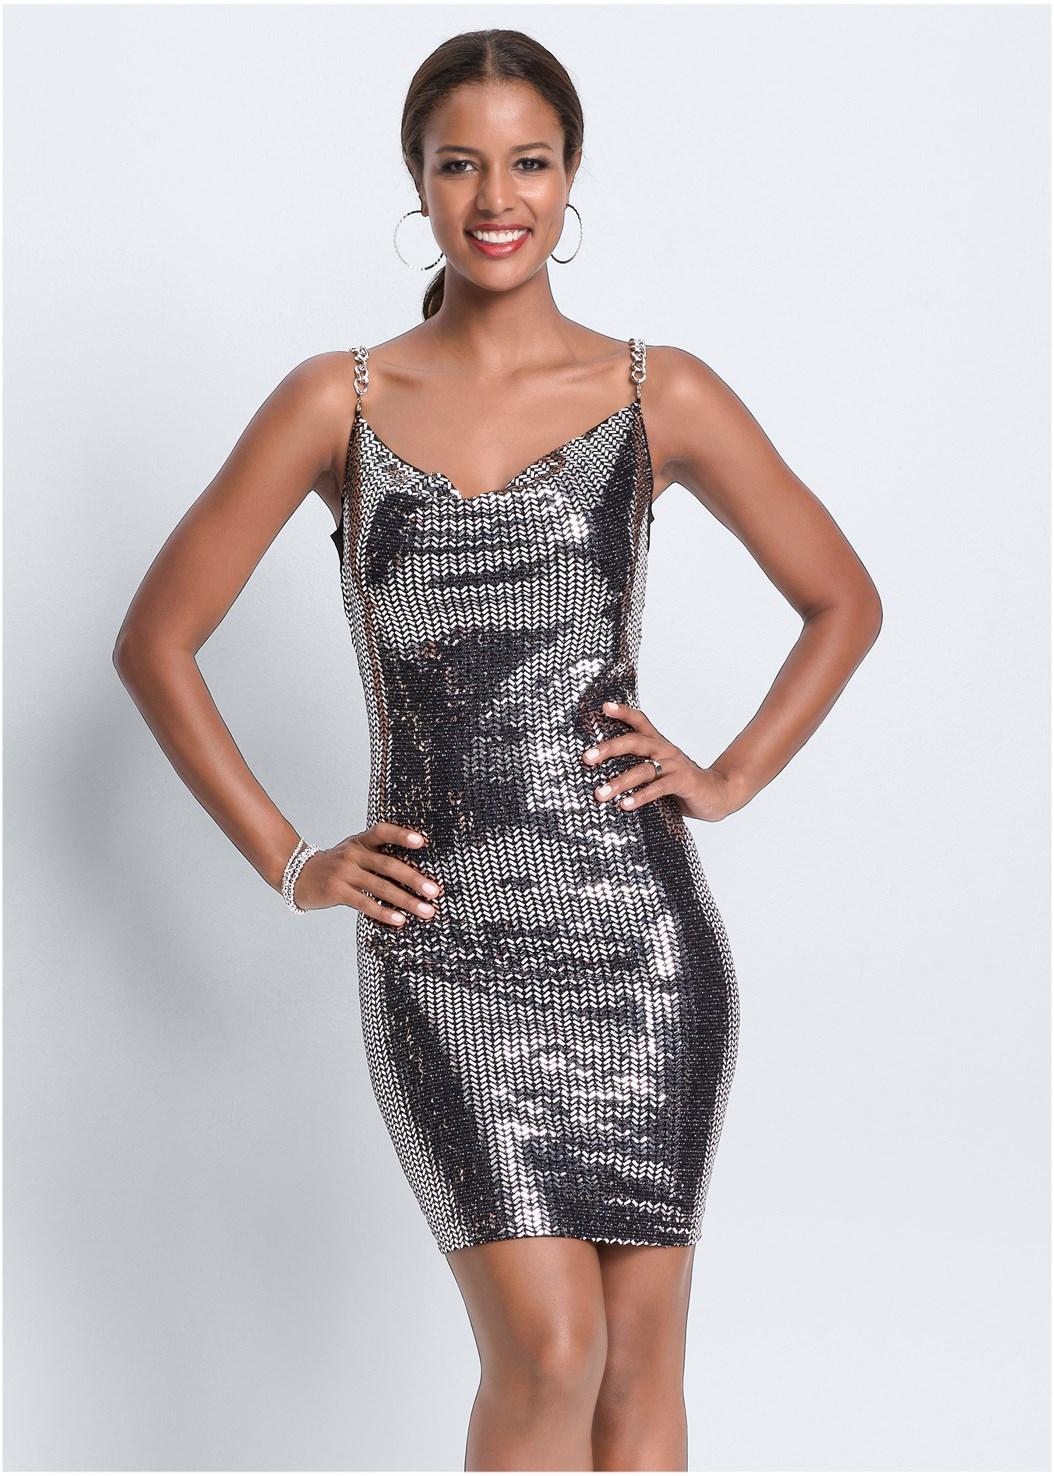 Metallic Dress,Smooth Longline Push Up Bra